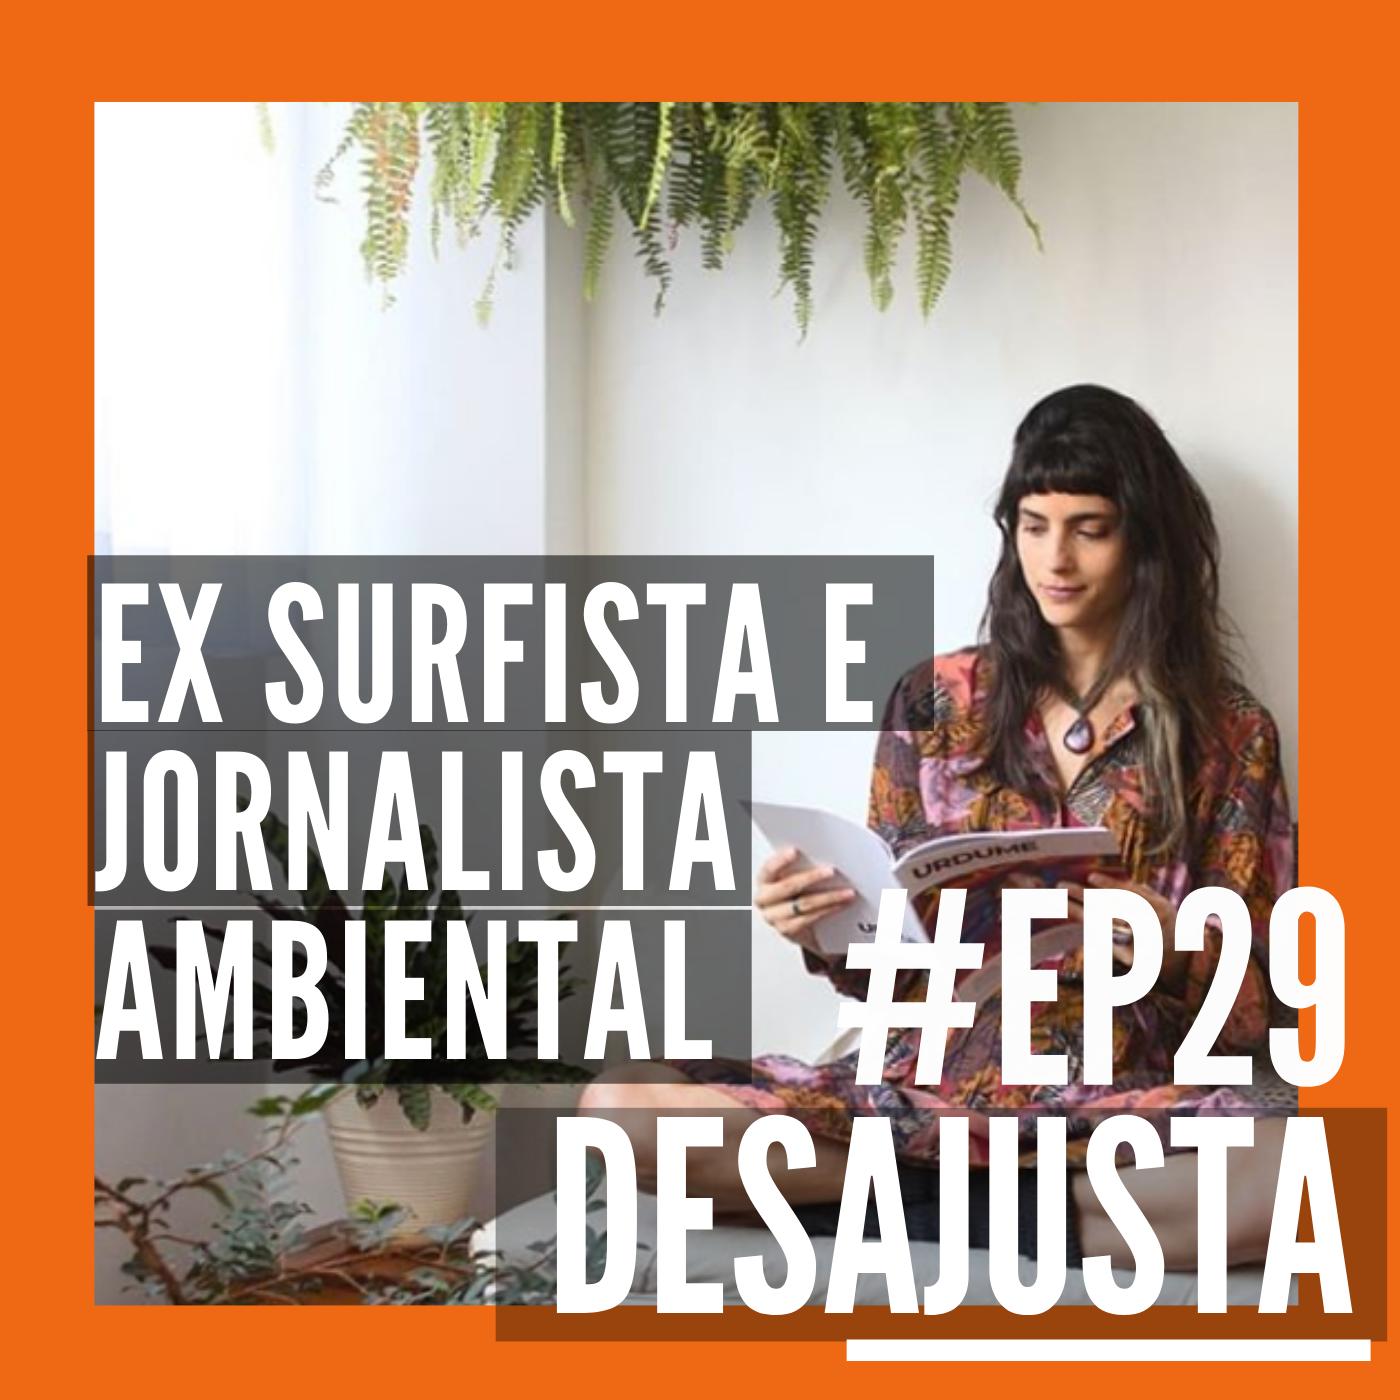 Ex surfista e jornalista ambiental - com Gabi Machado (Roupartilhei)